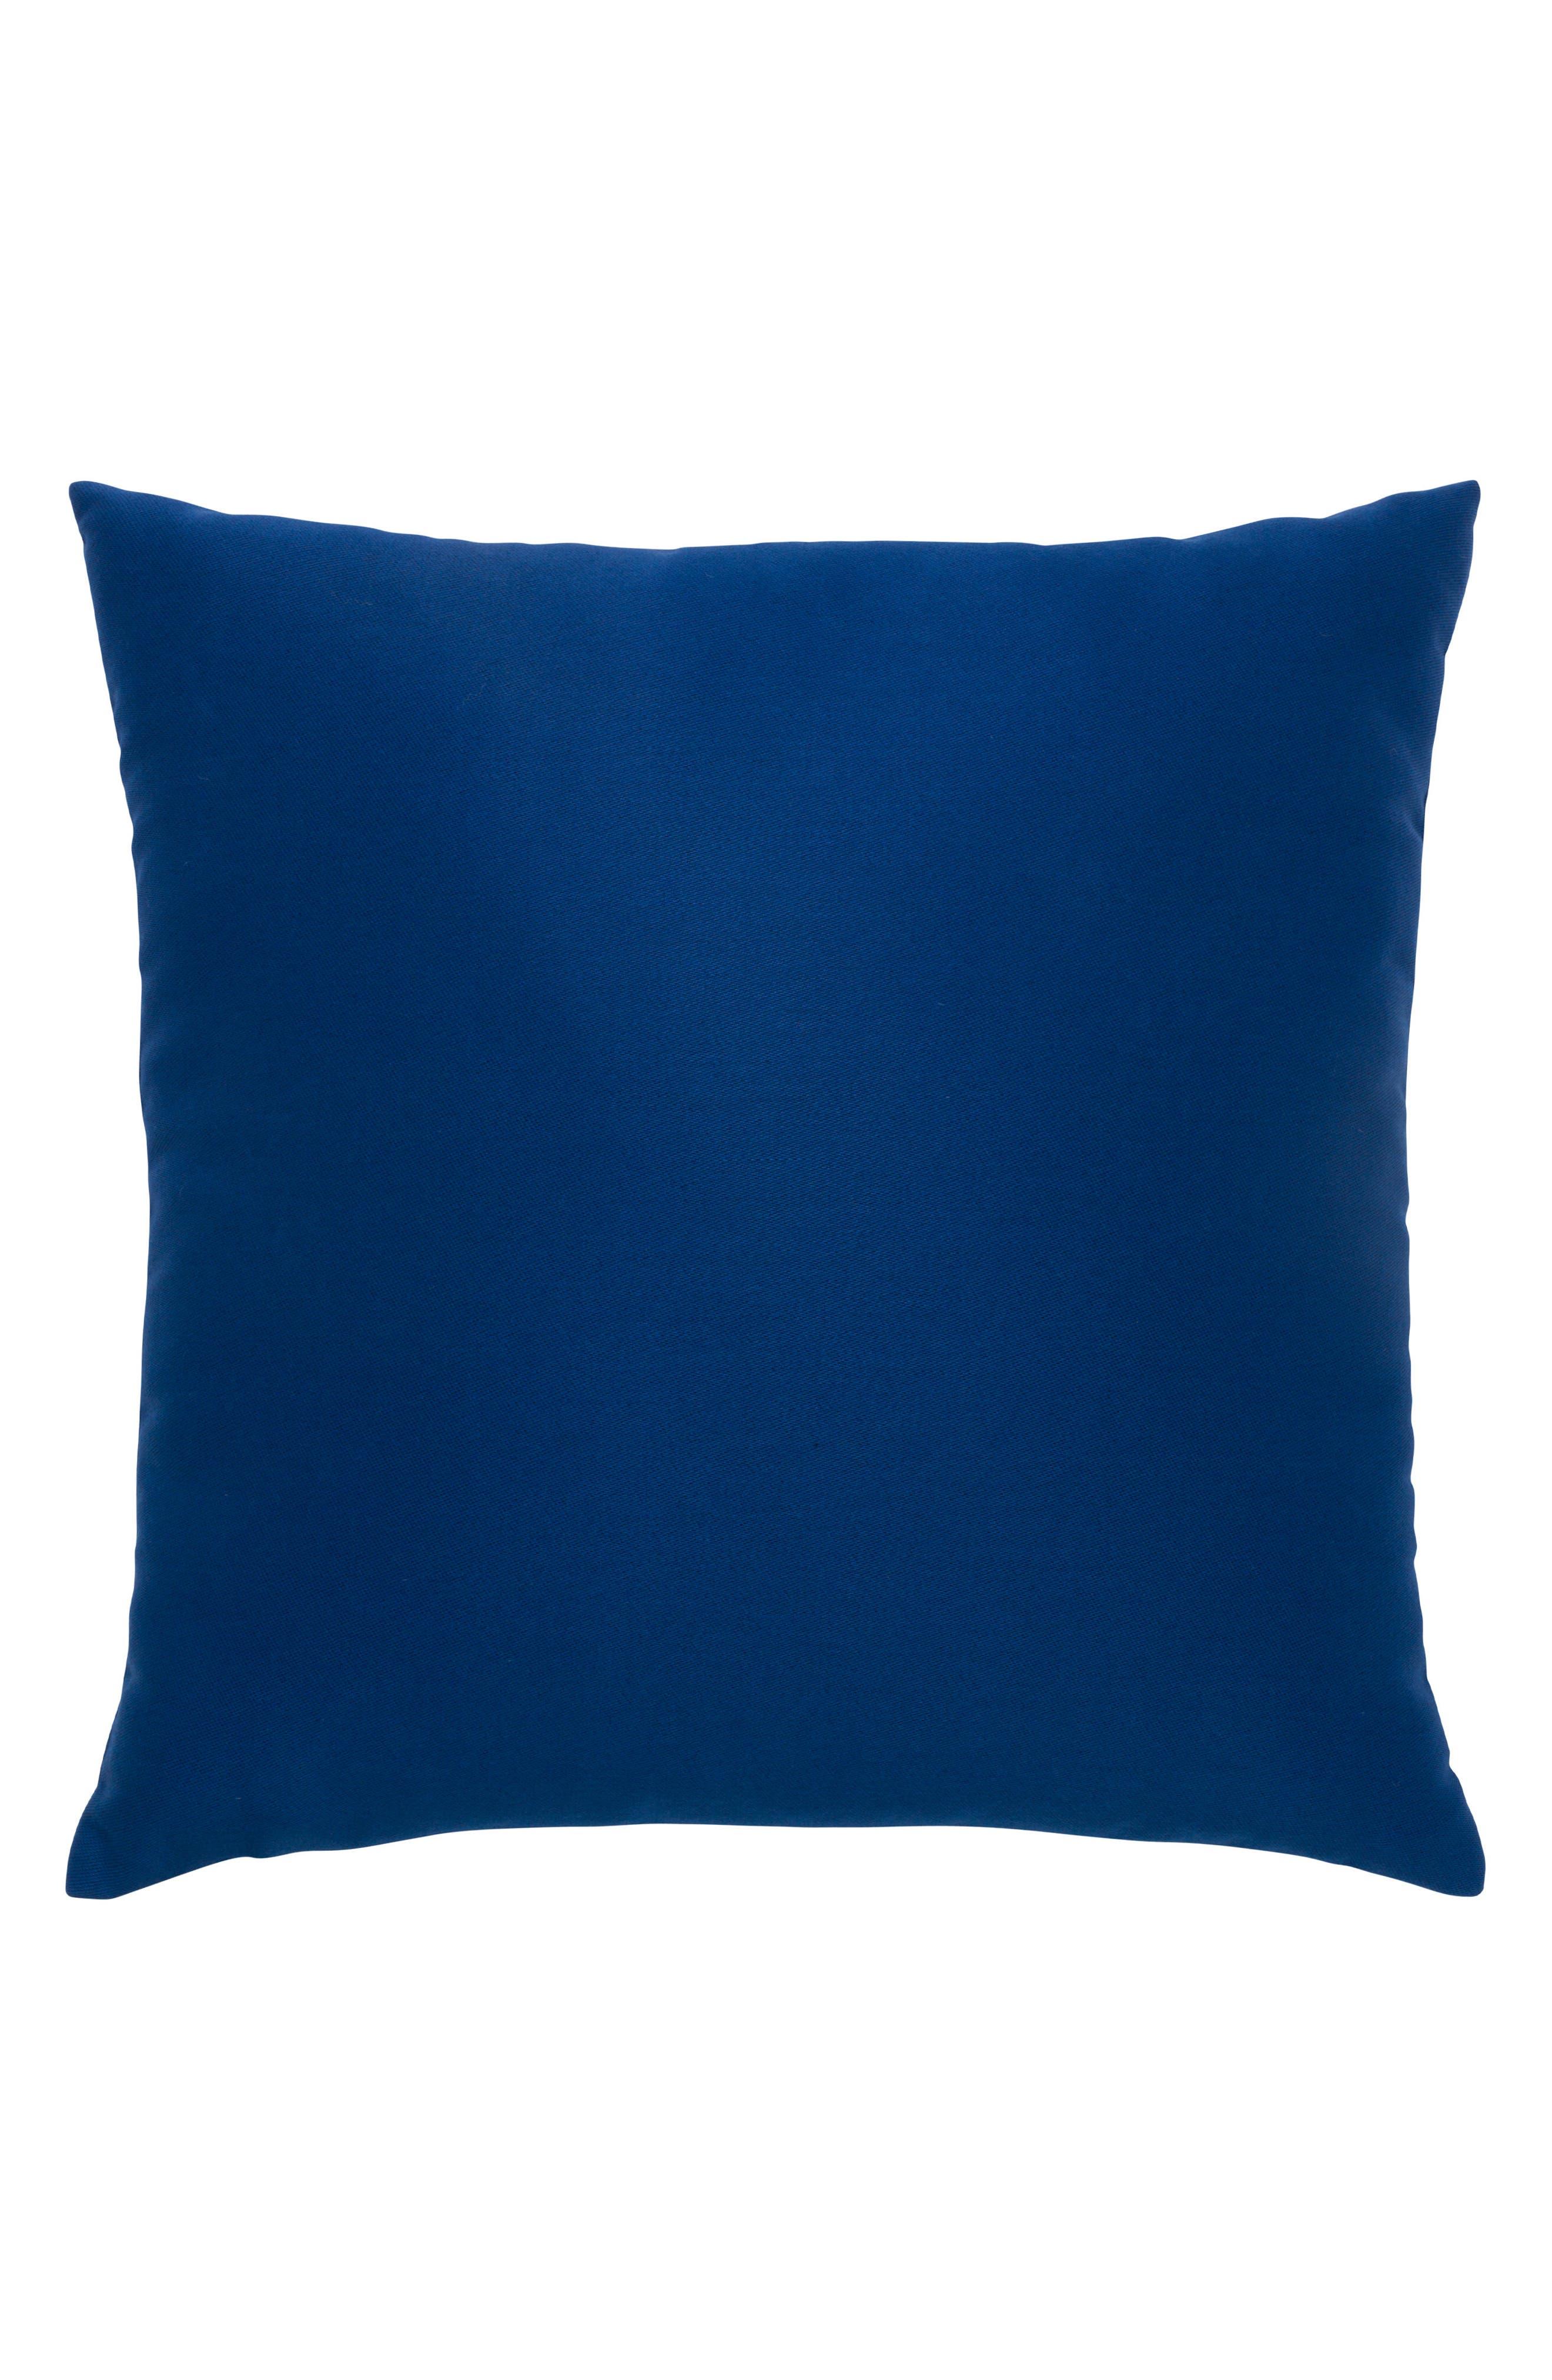 Ombré Azure Indoor/Outdoor Accent Pillow,                             Alternate thumbnail 2, color,                             400